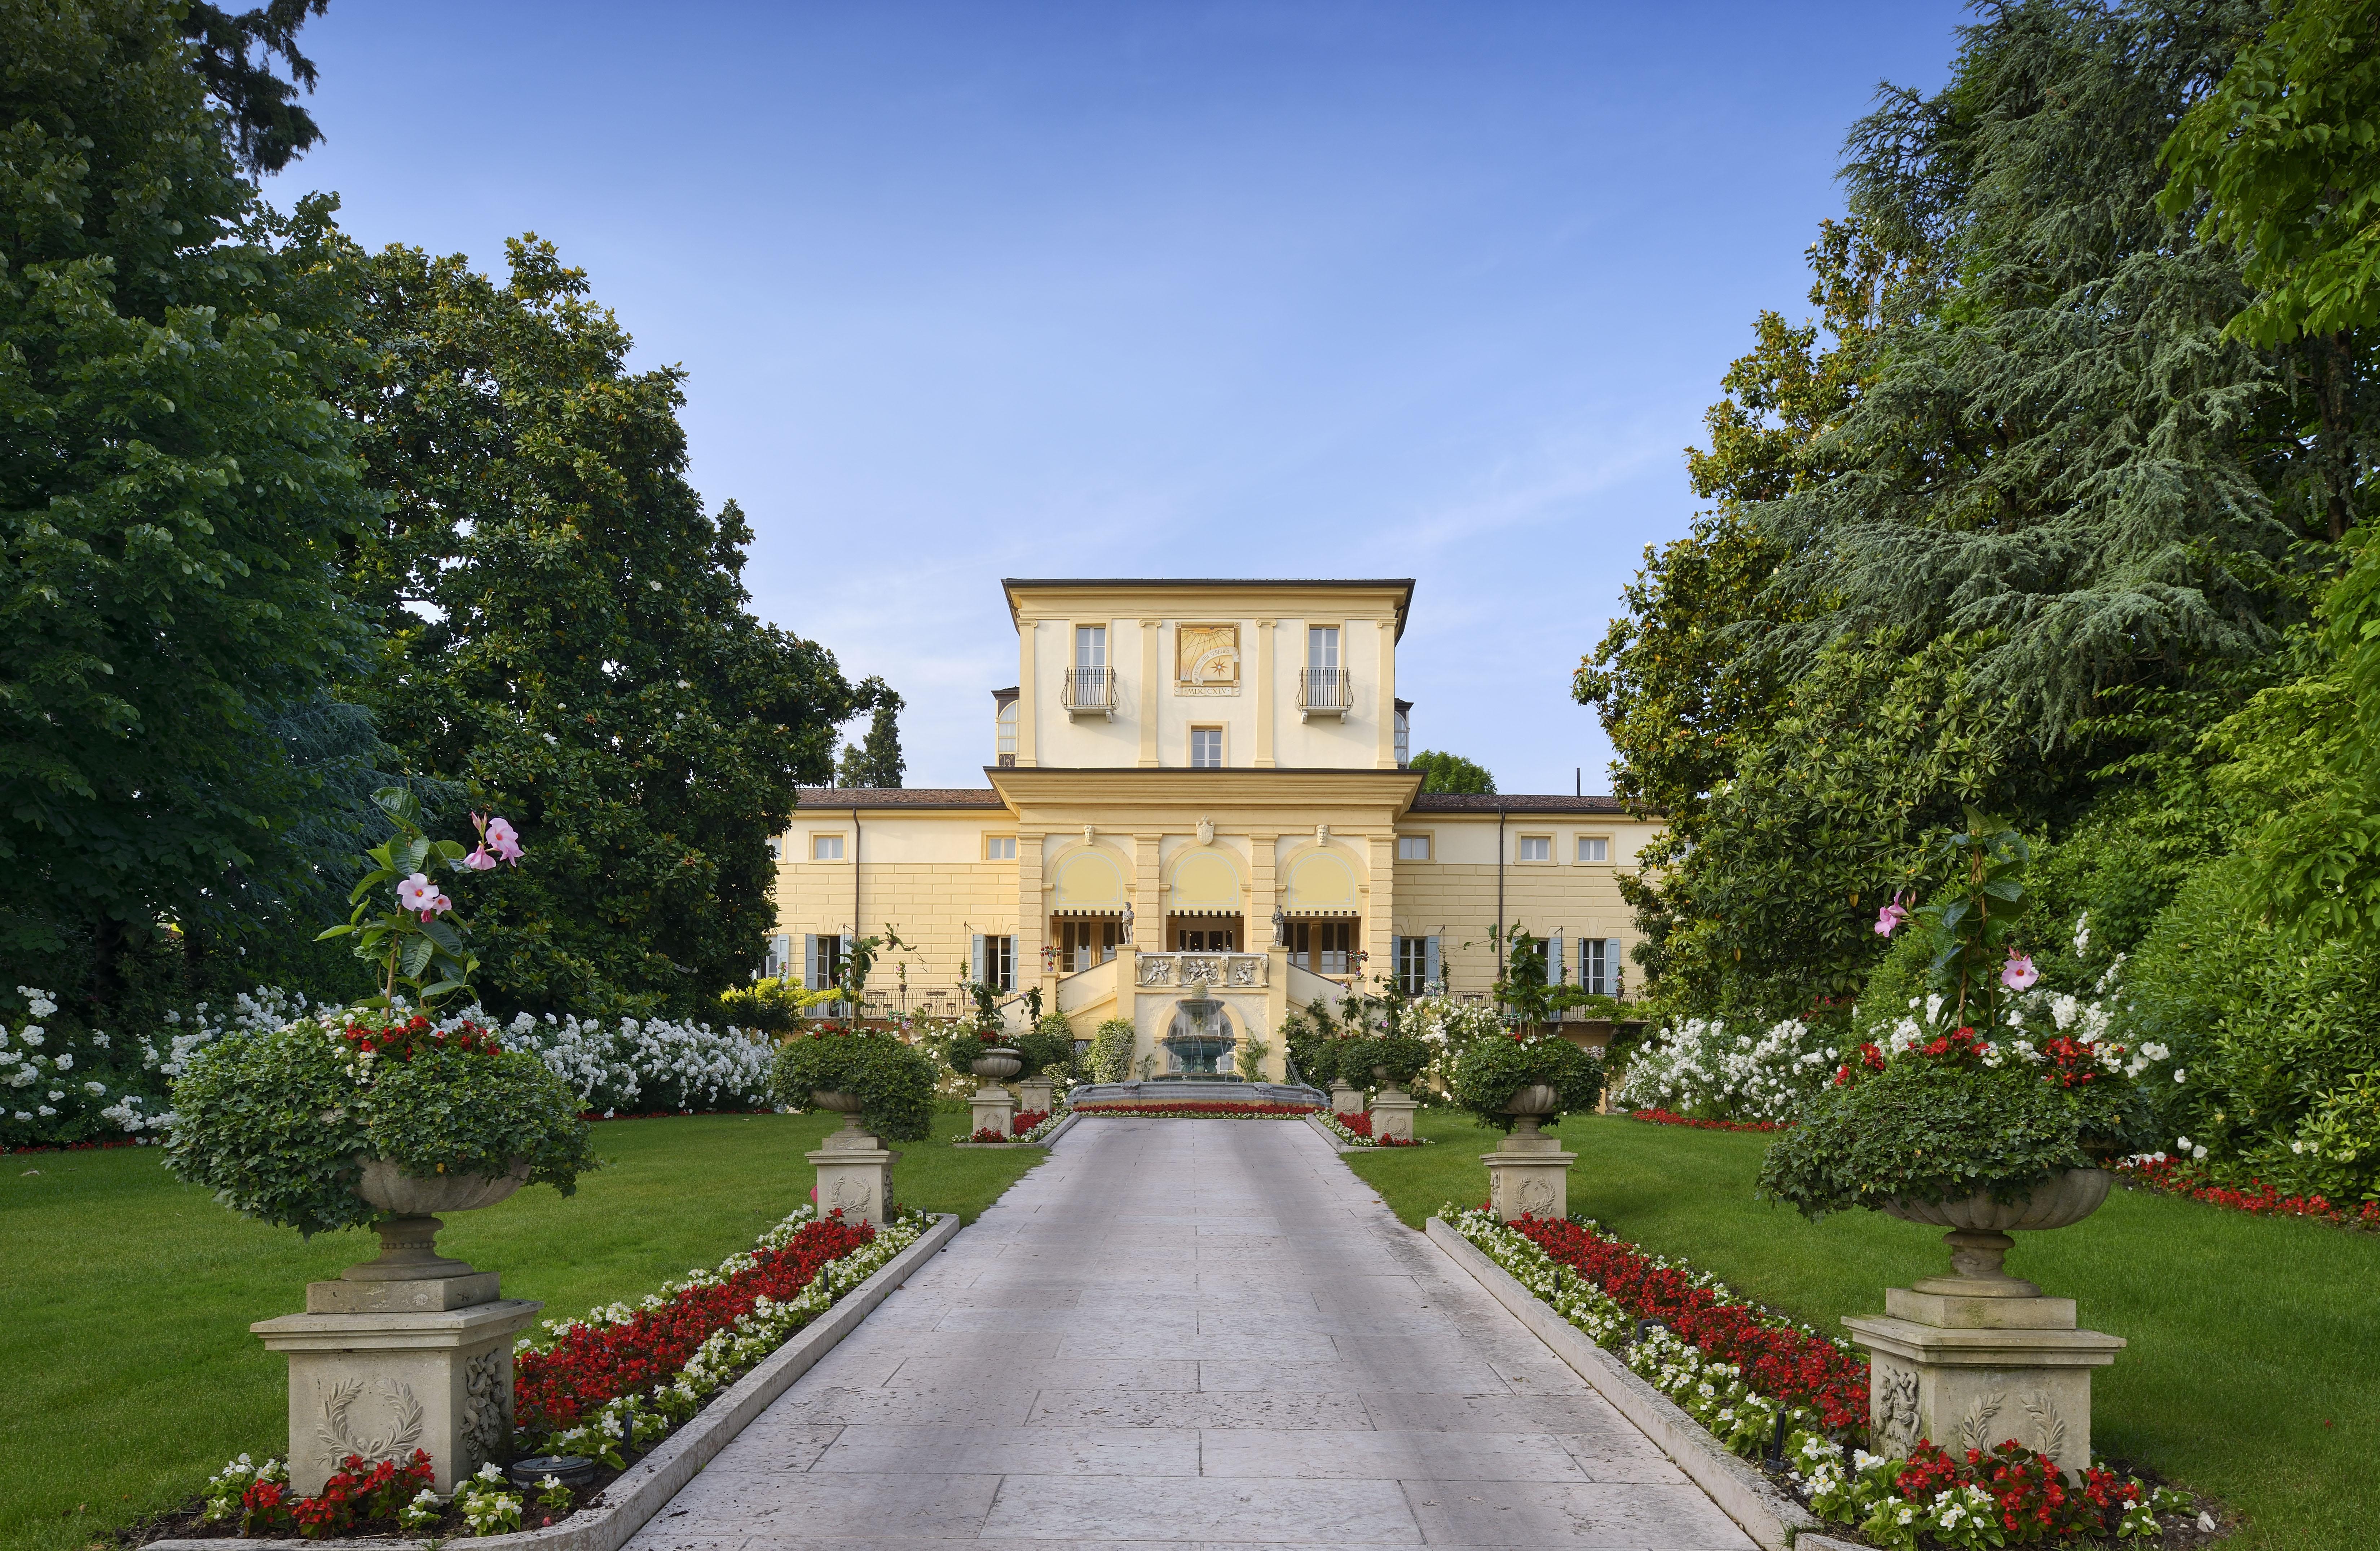 SLH Byblos Art Hotel Villa Amista | Bei Verona